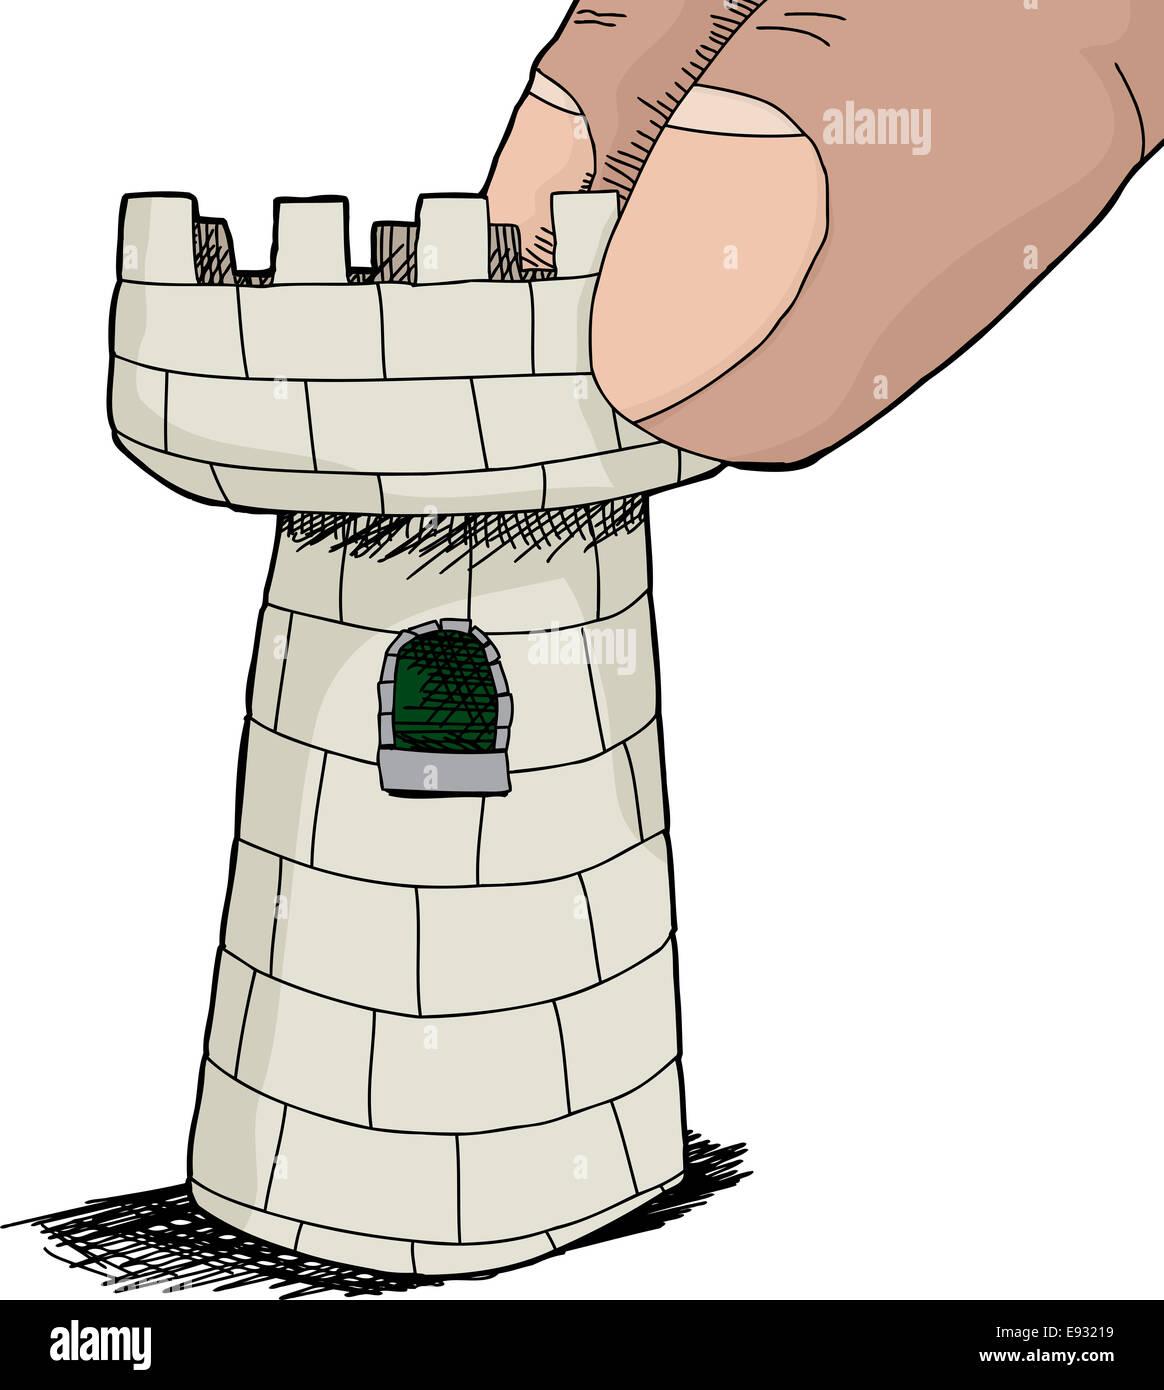 Hand drawn cartoon castle tower stockfotos hand drawn cartoon castle tower bilder alamy - Nasse fenster uber nacht ...